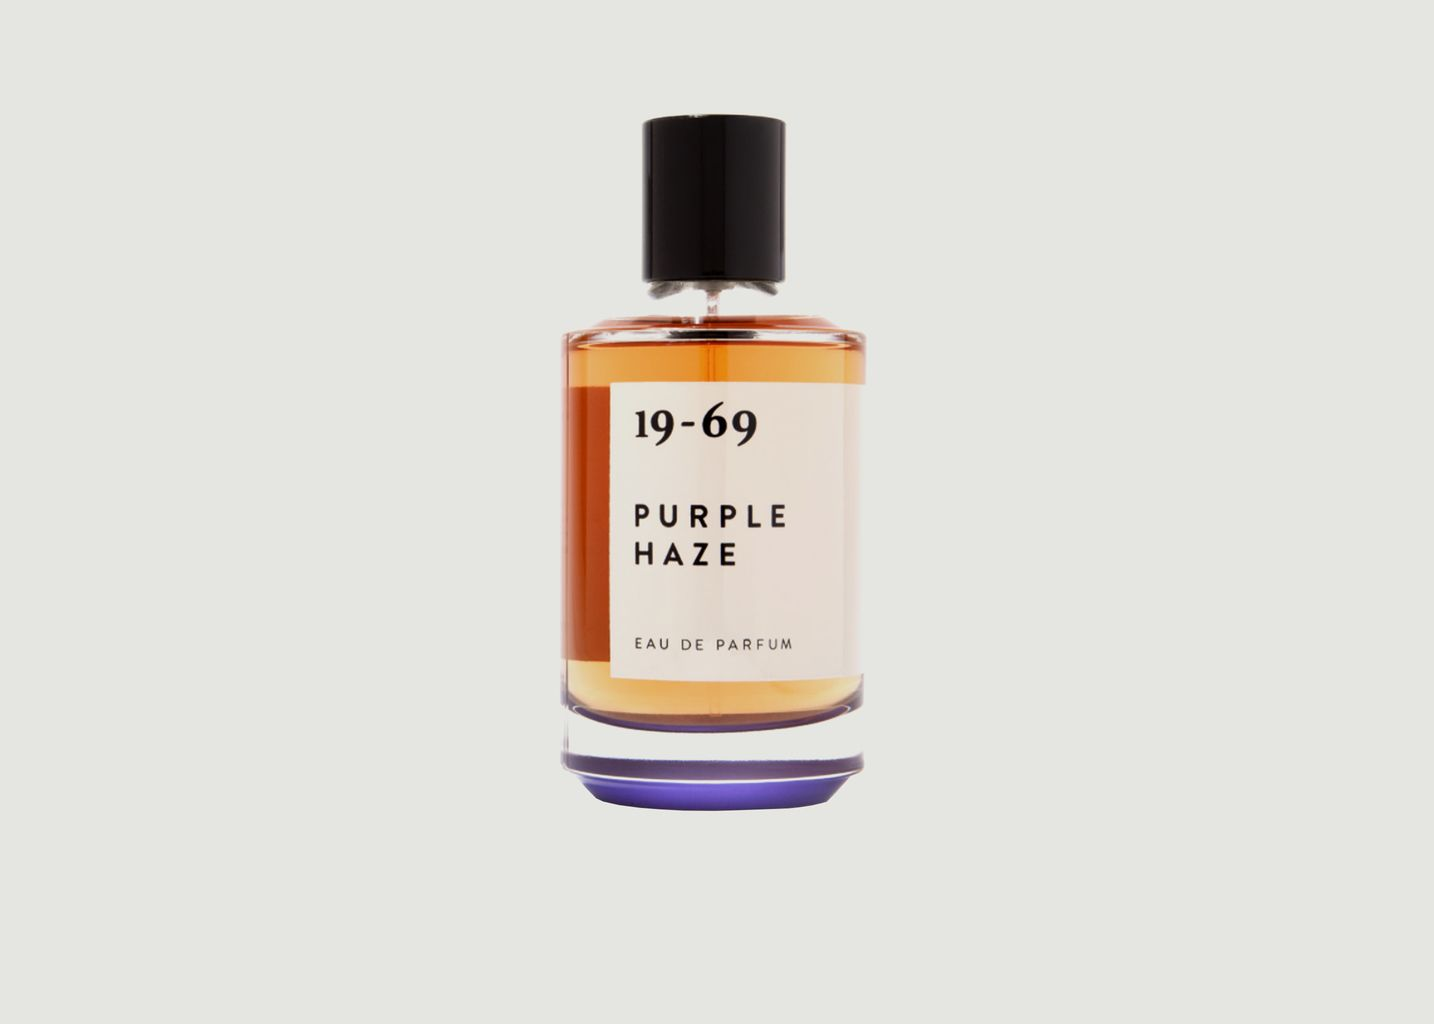 Purple Haze Eau de Parfum 100 ml  - 19-69